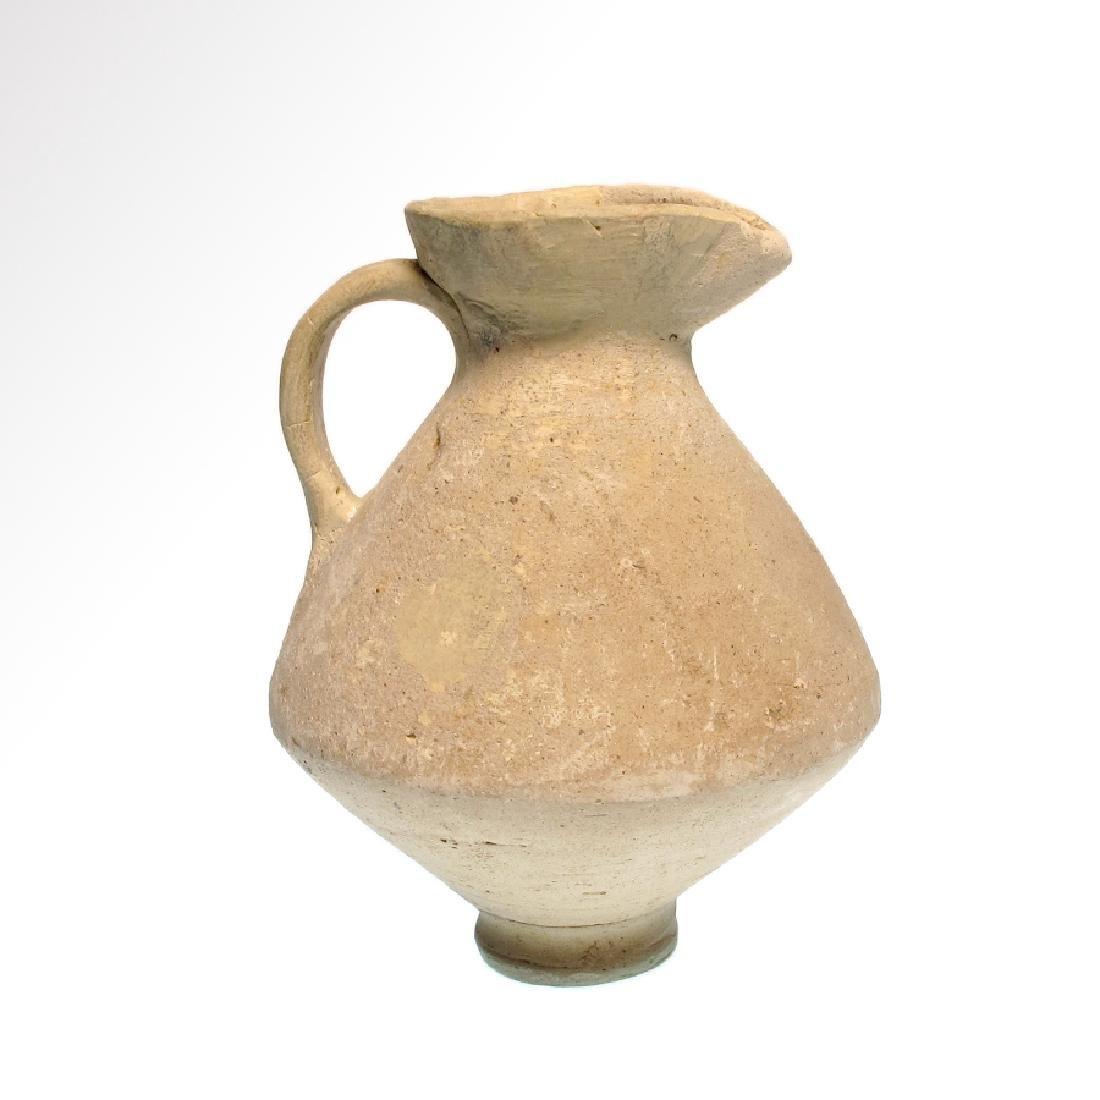 Roman Terracotta Jug, Trefoil lip, c. 1st Century A.D.